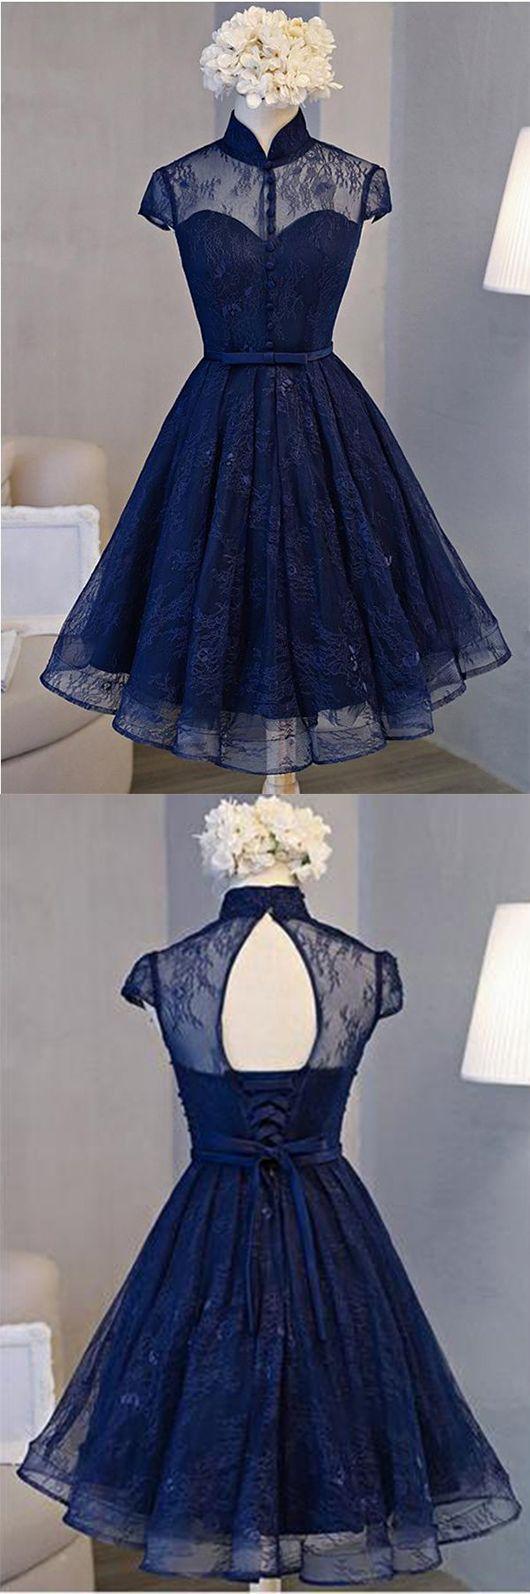 Vintage homecoming dresseslace homecoming dressesnavy blue